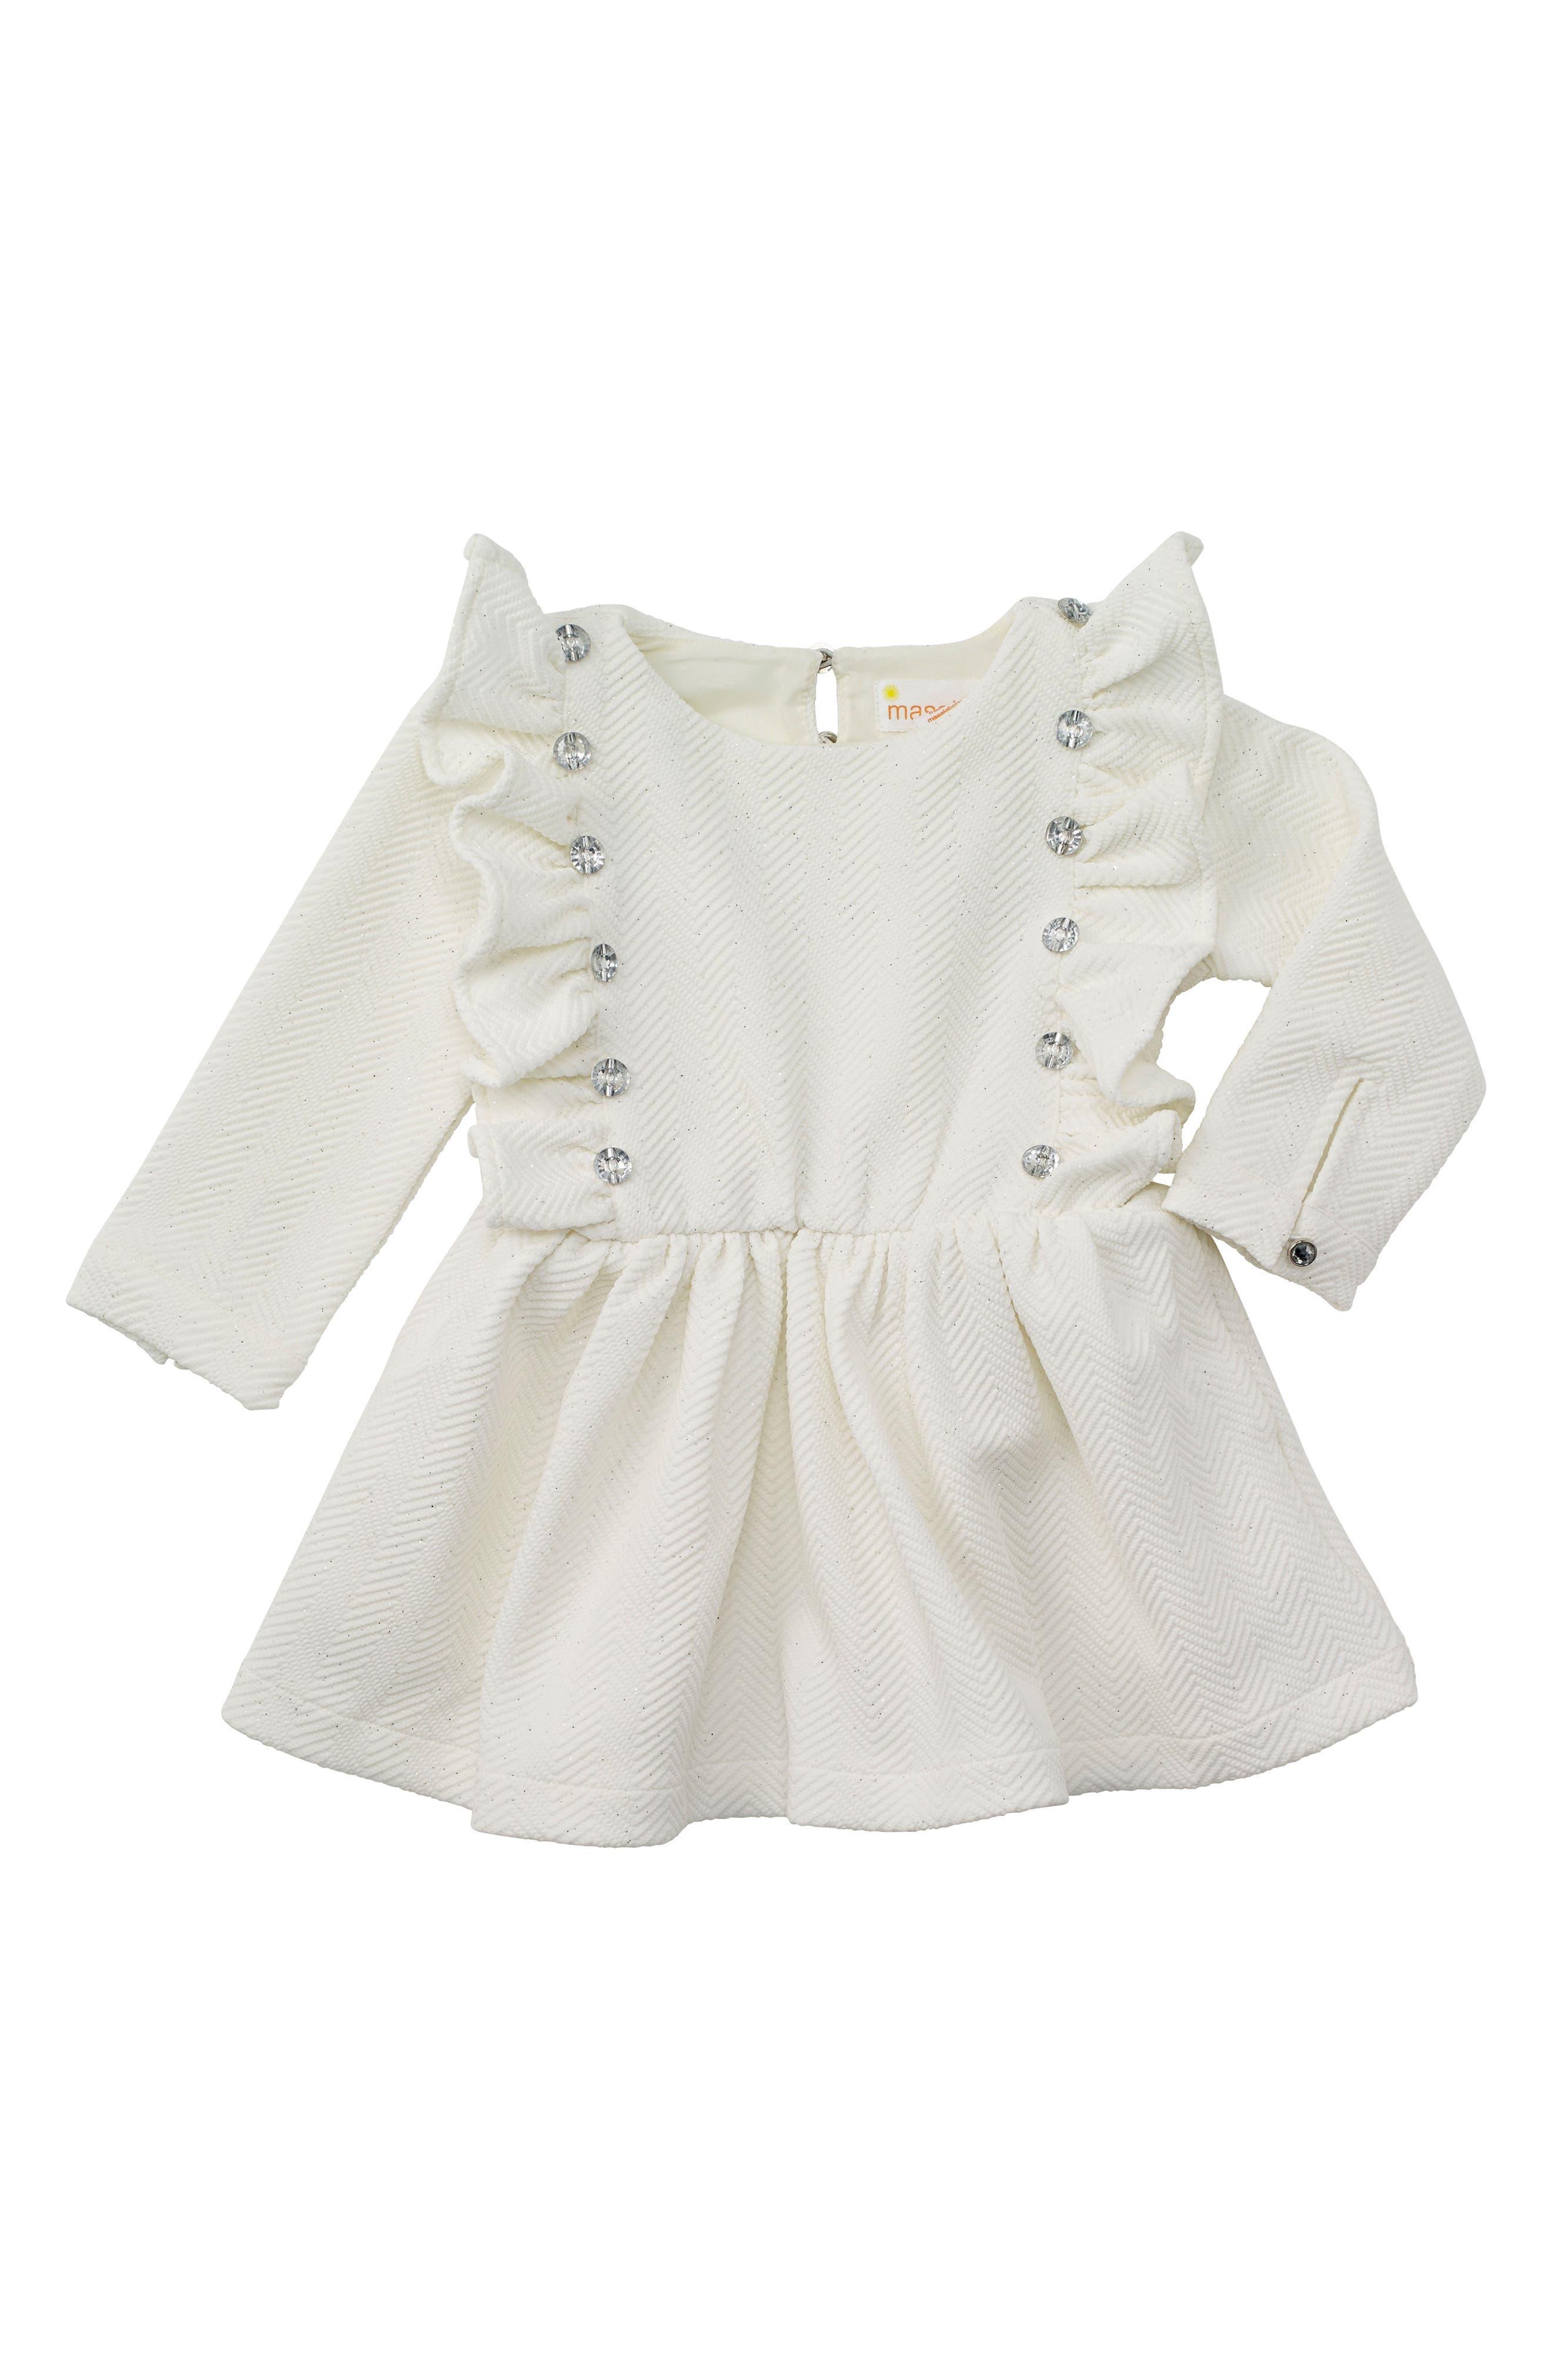 Fantasia Dress,                             Alternate thumbnail 4, color,